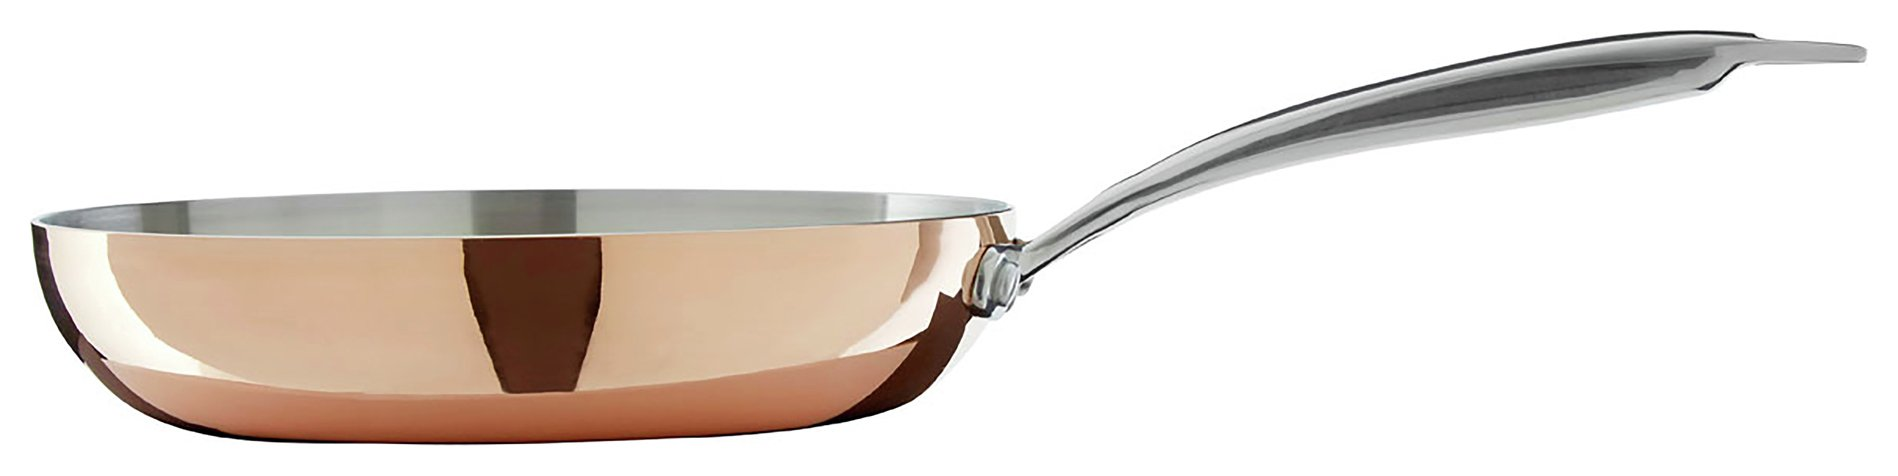 Image of Minerva Copper Finish 24cm Frying Pan.